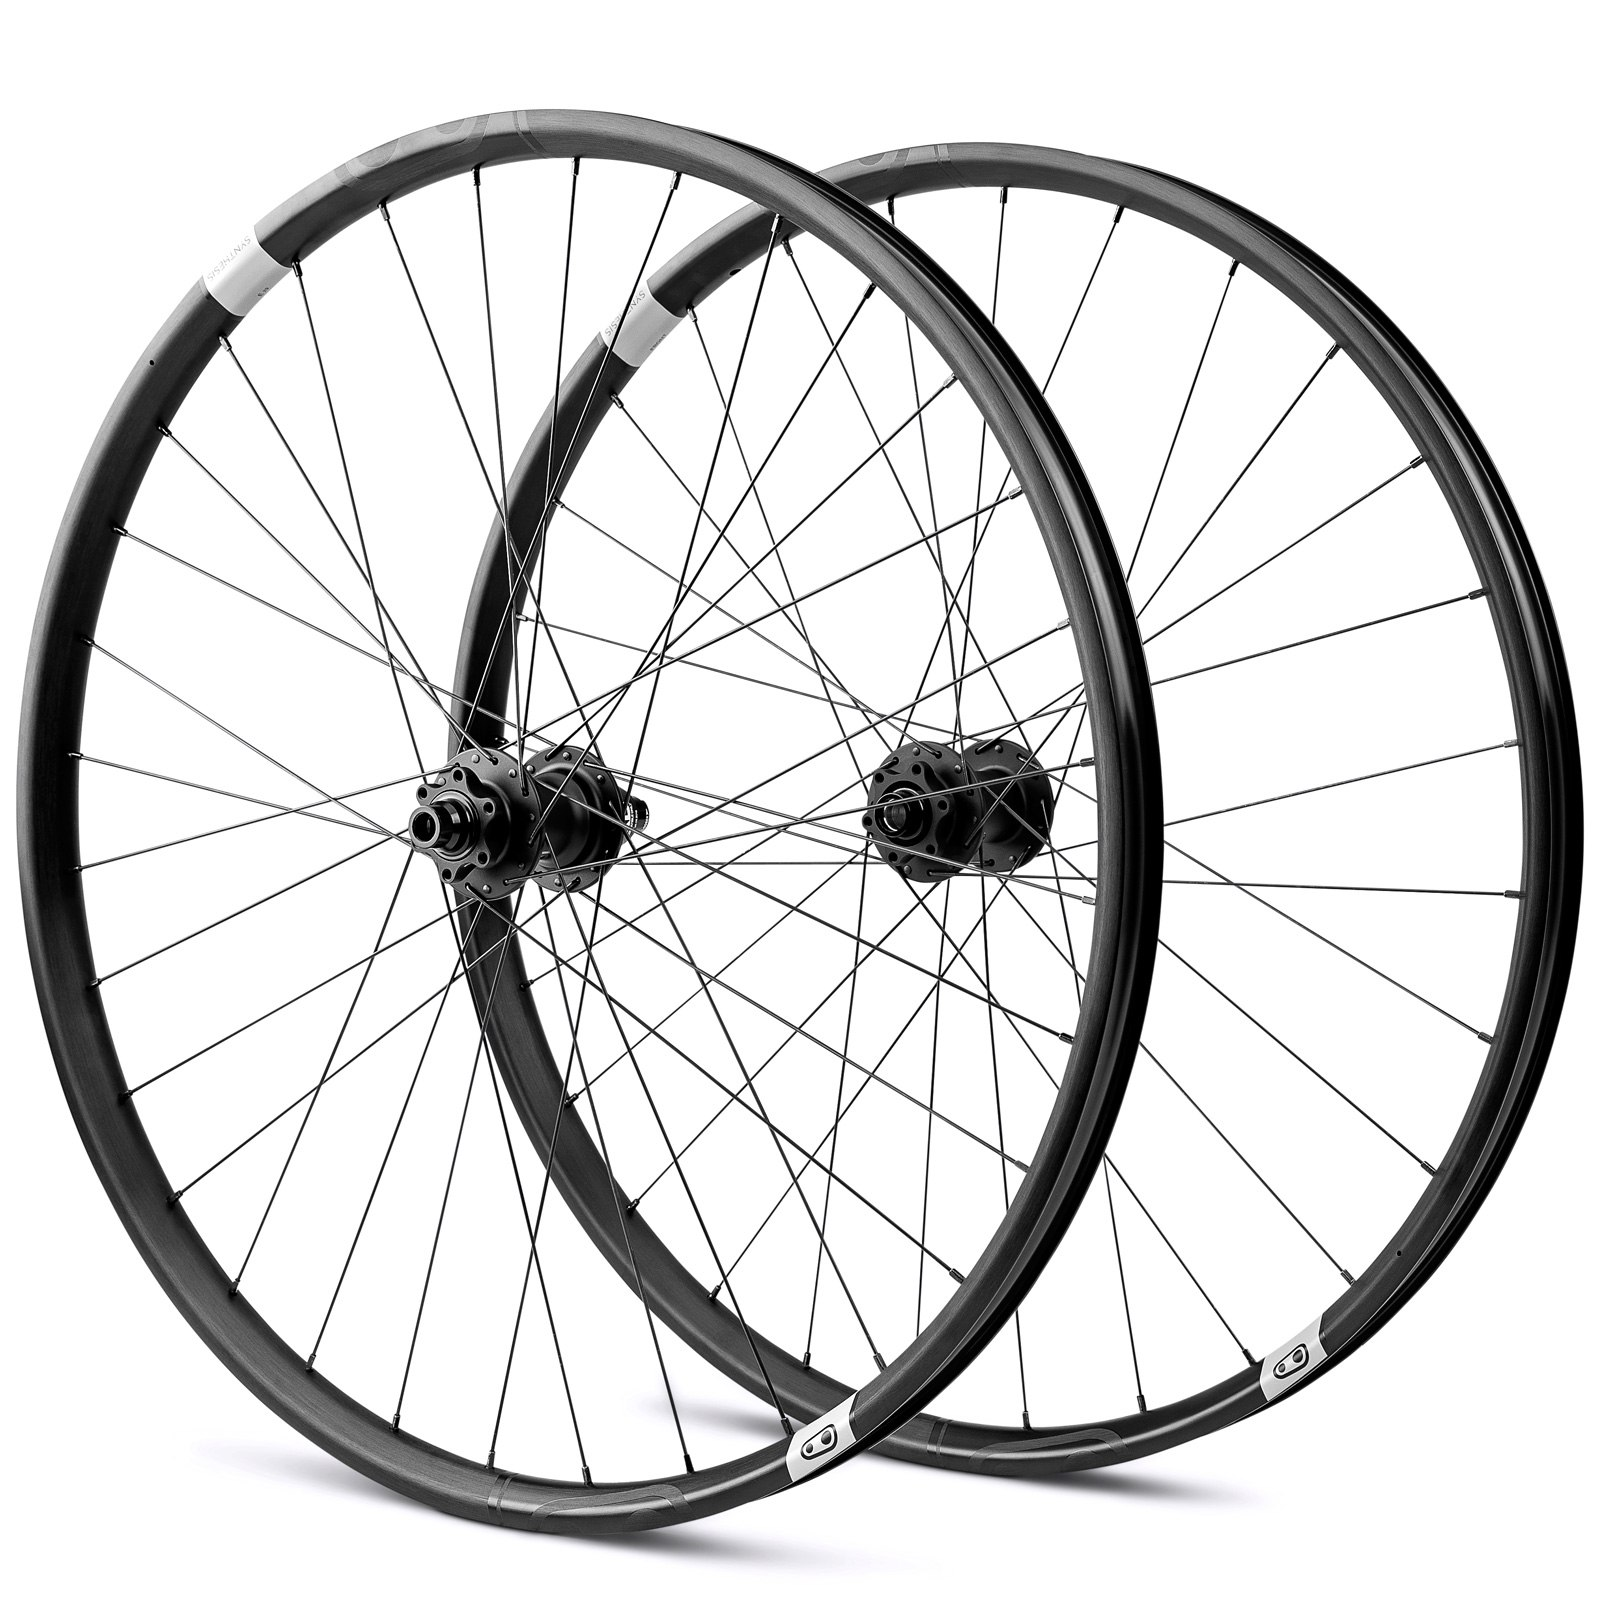 Crankbrothers Synthesis E-MTB Alloy - 29 Inch Wheelset - 6-Bolt - SRAM XD - FW: 15x110mm | RW: 12x148mm Boost